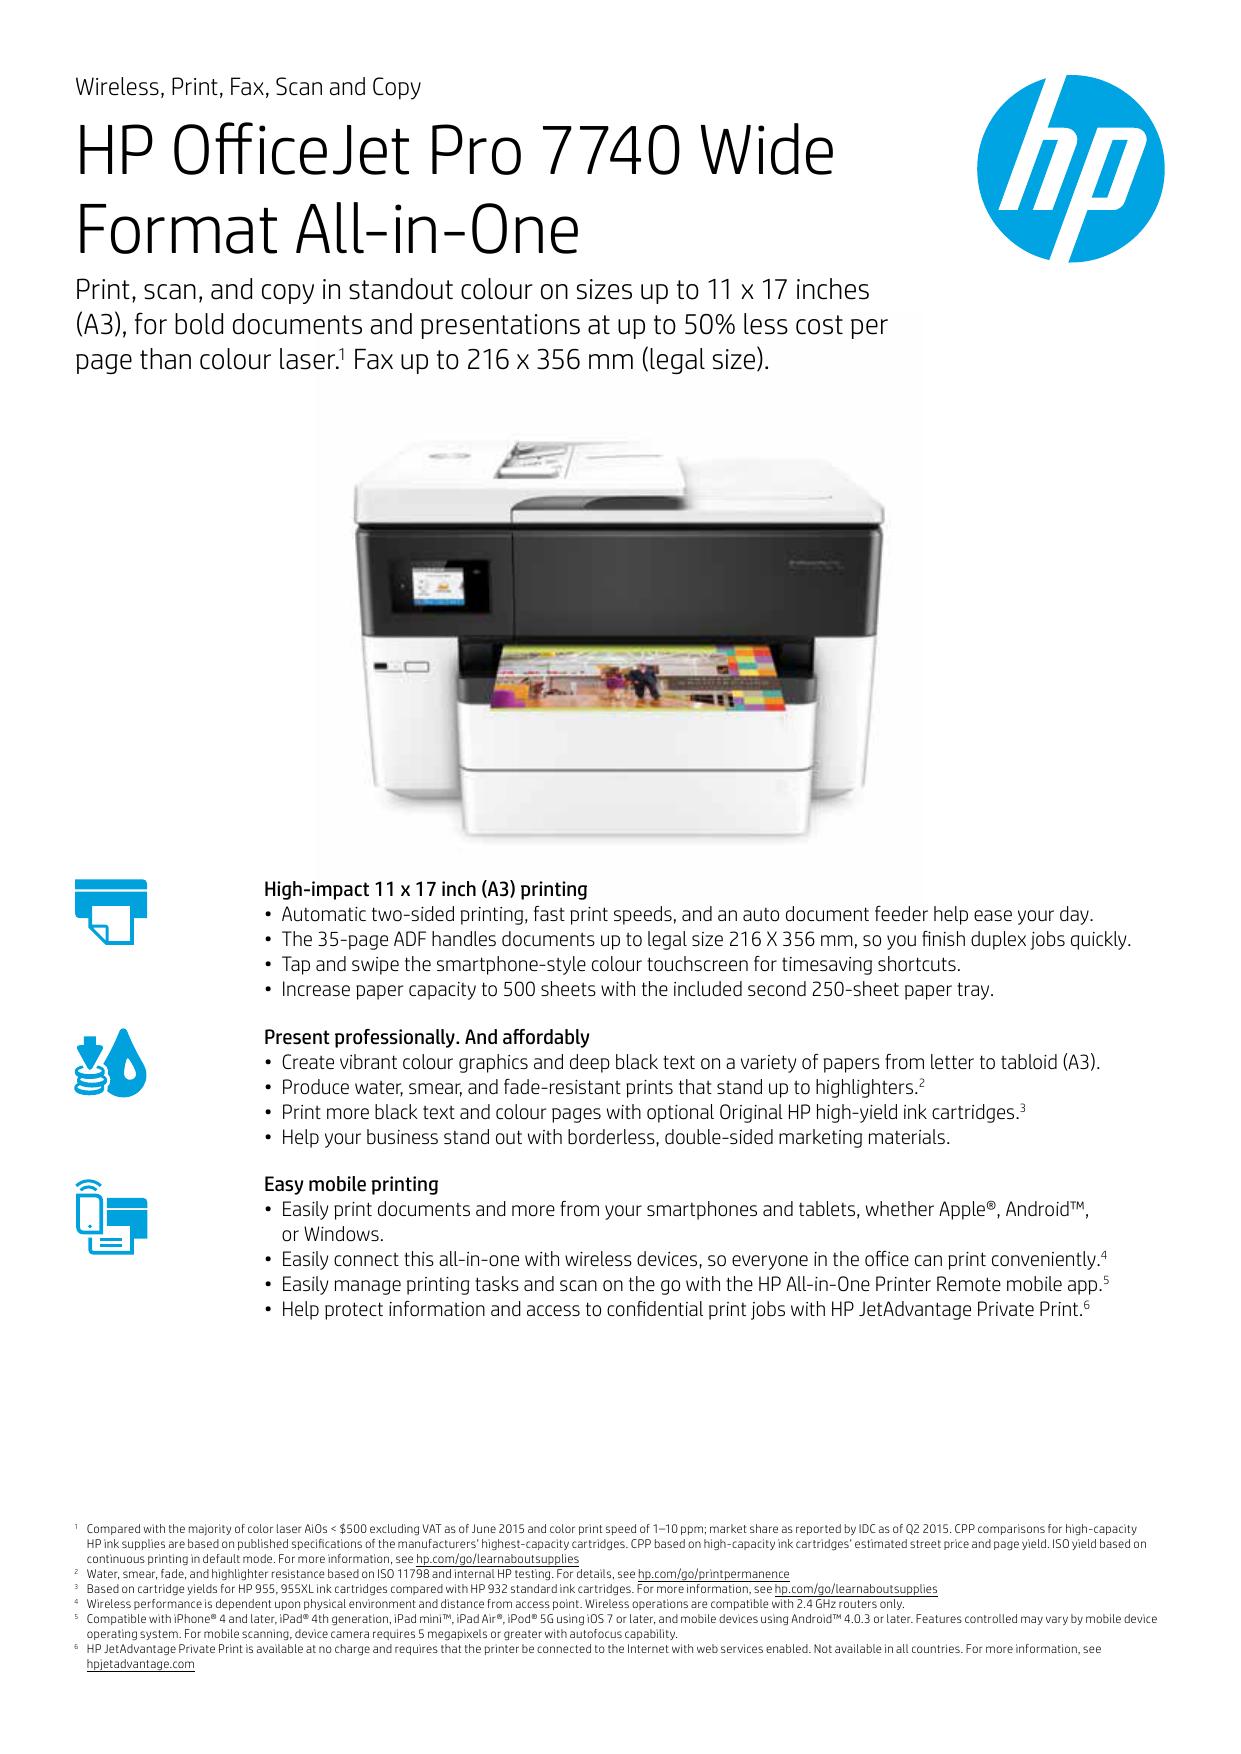 HP OfficeJet Pro 7740 Wide Format All-in-One   manualzz com